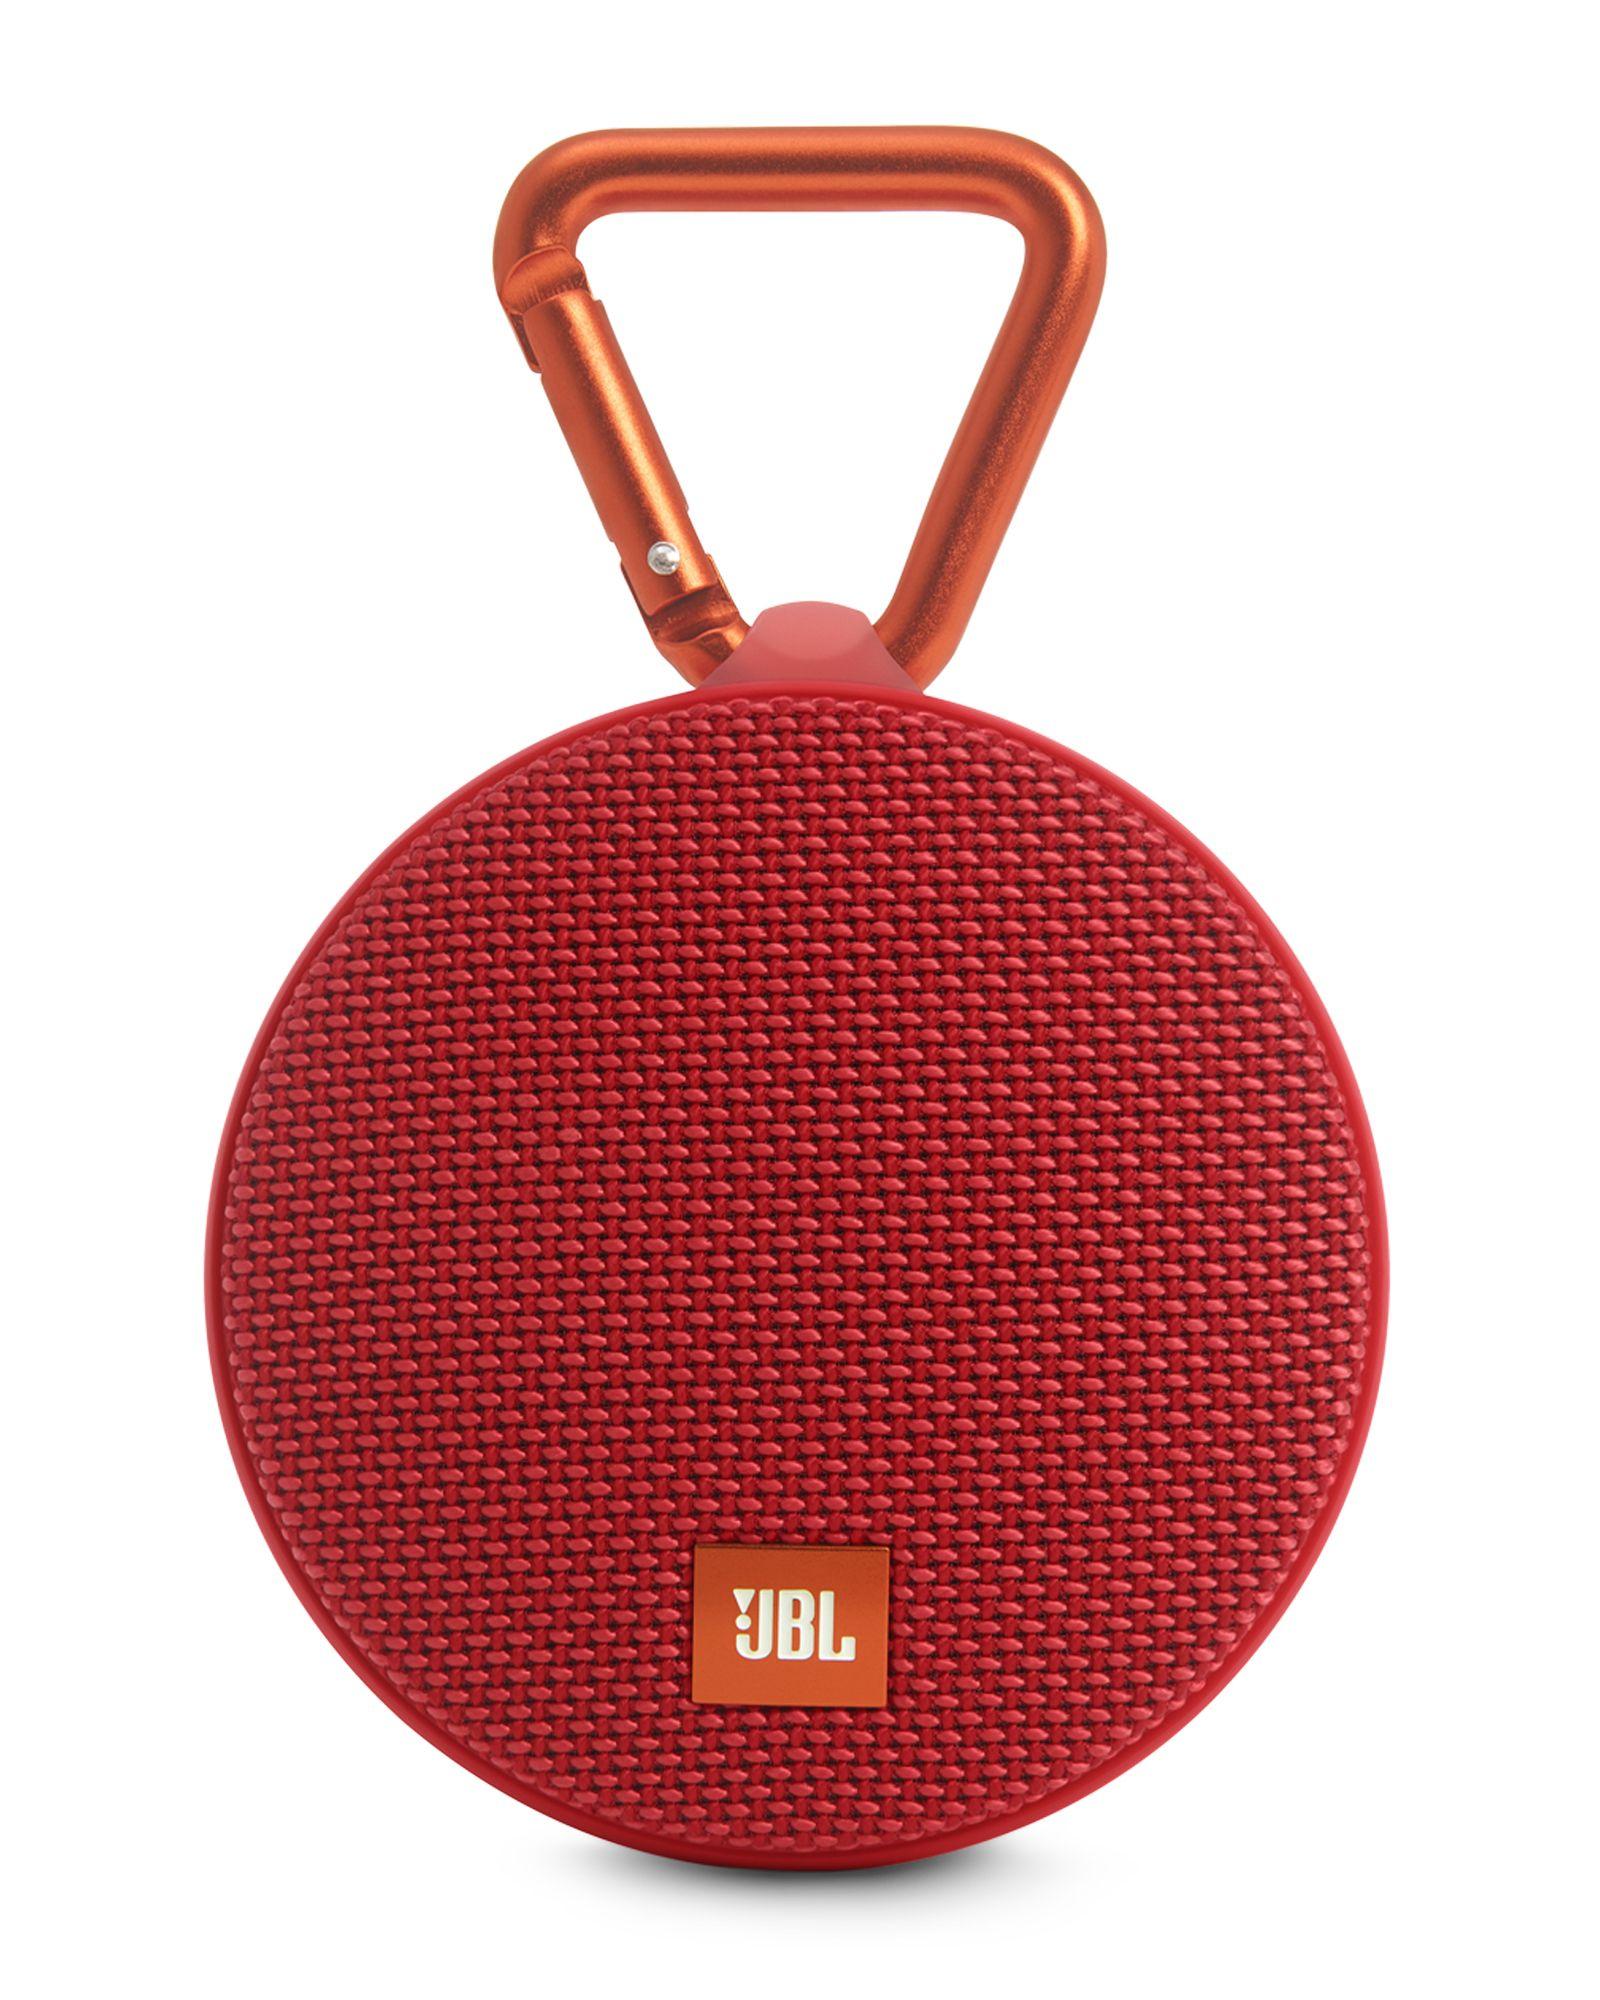 Jbl Red Clip 2 Portable Bluetooth Speaker | Bluetooth